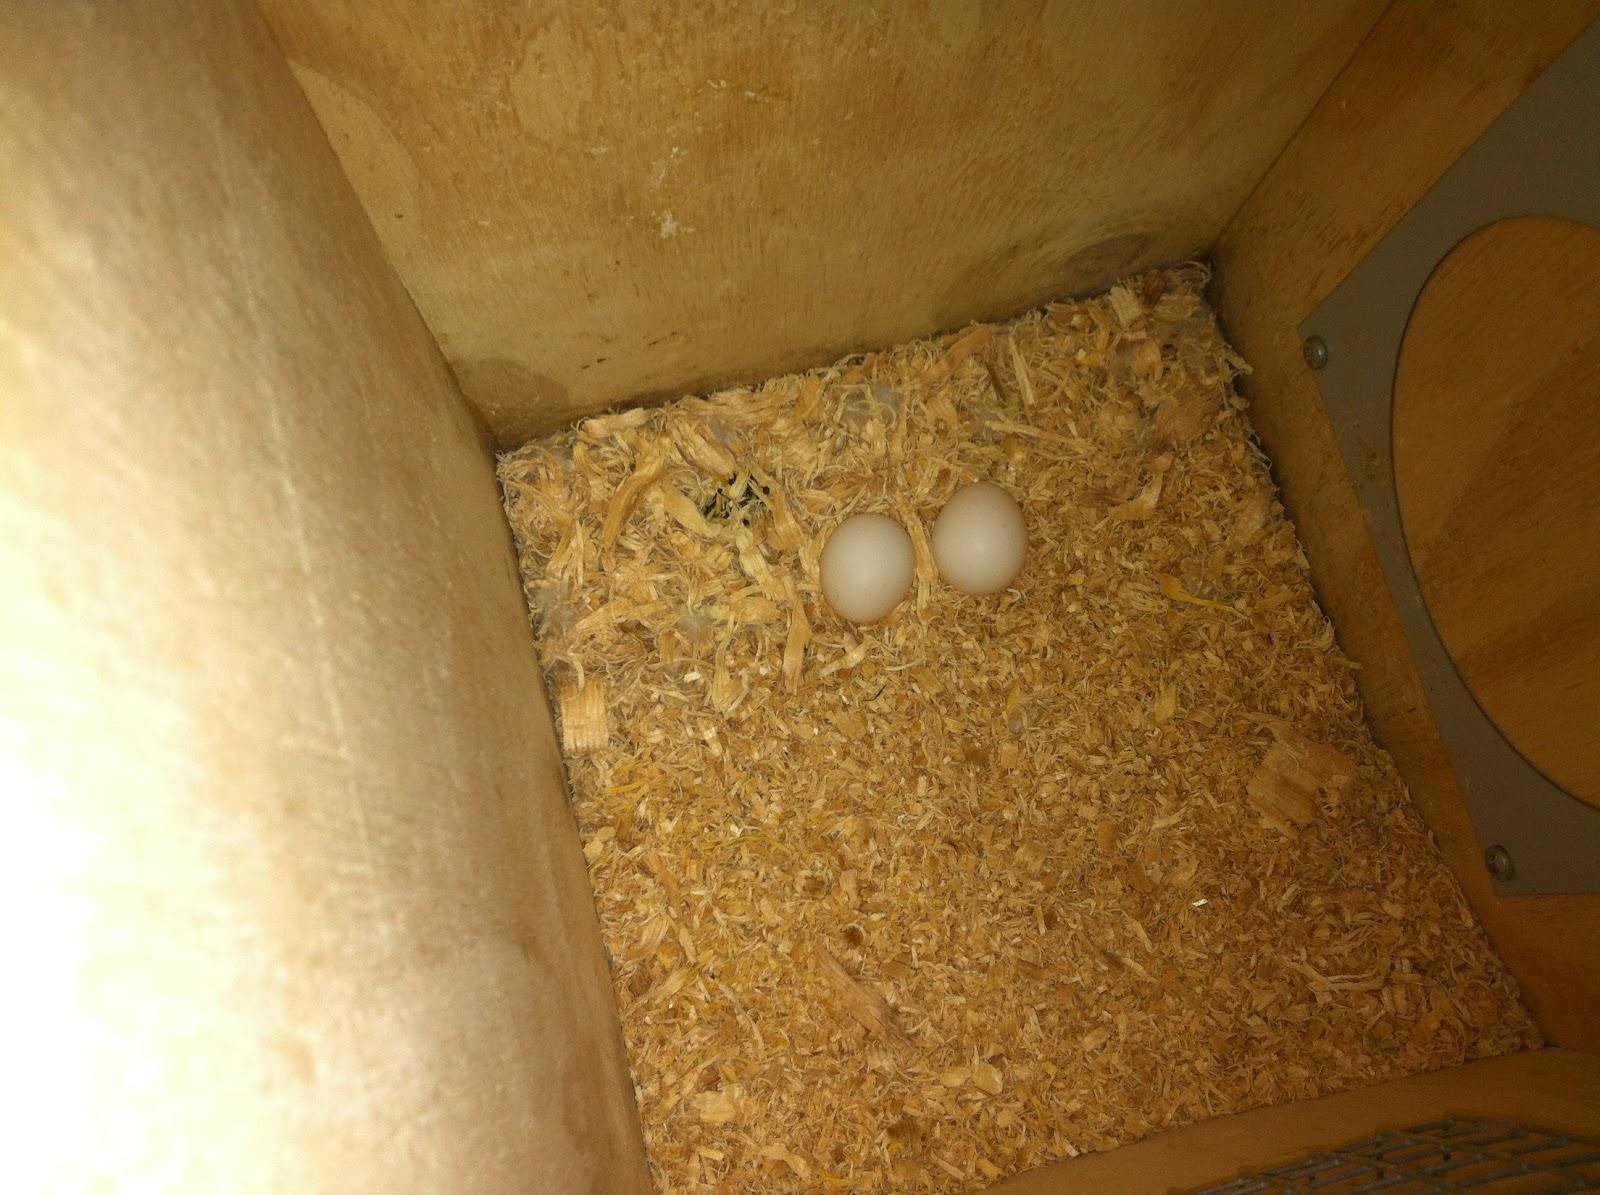 Breeding Box Breeding Boxes / Nesting Boxes